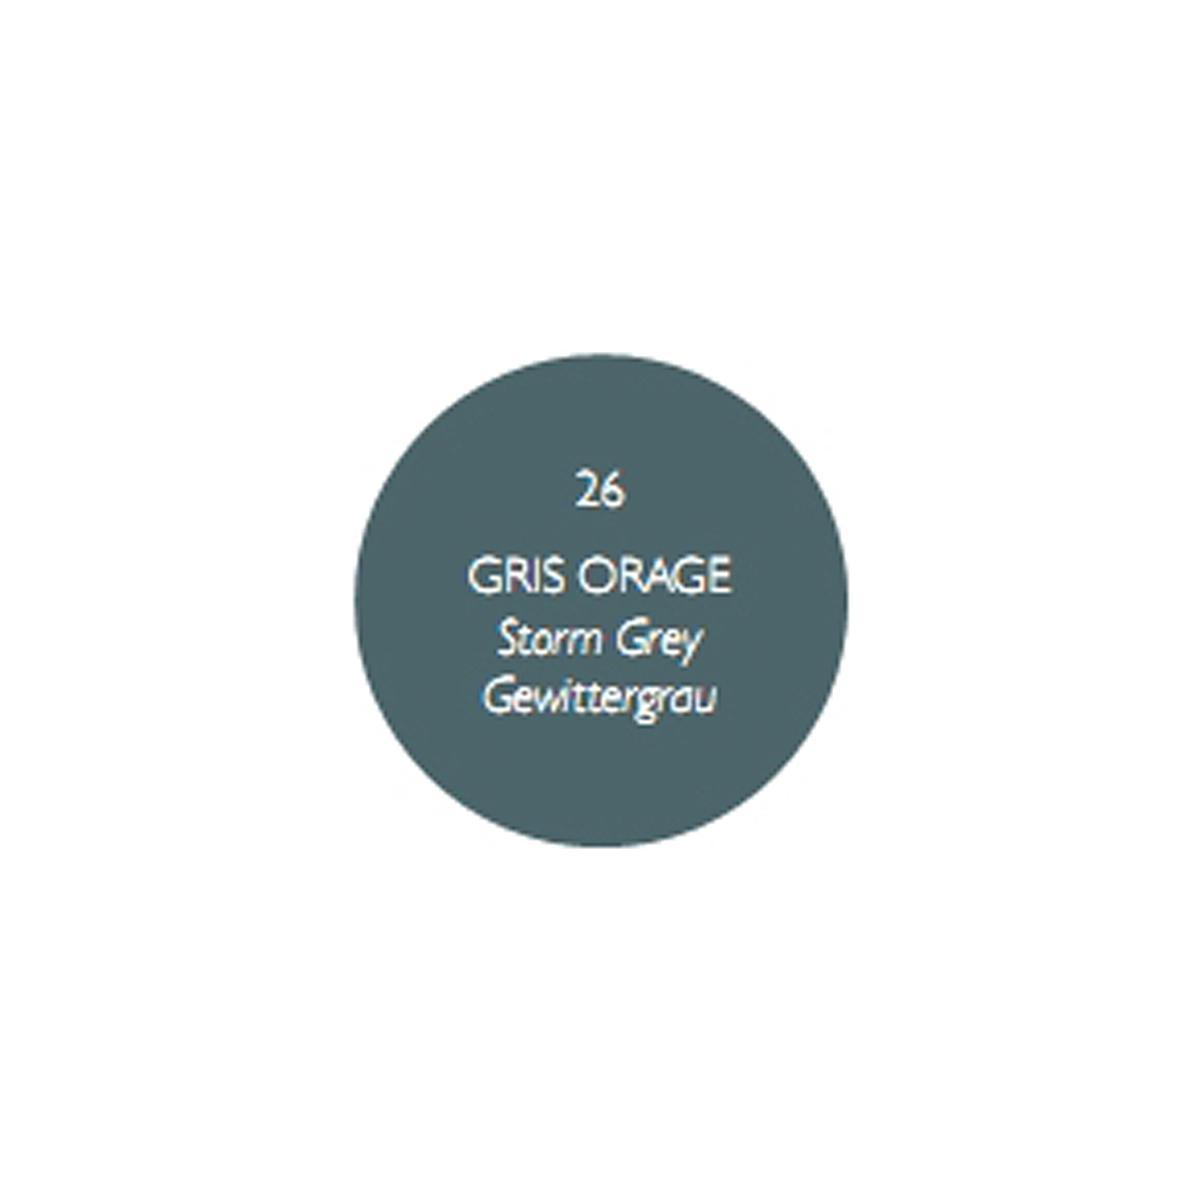 1900 by Fermob Guéridon gris orage